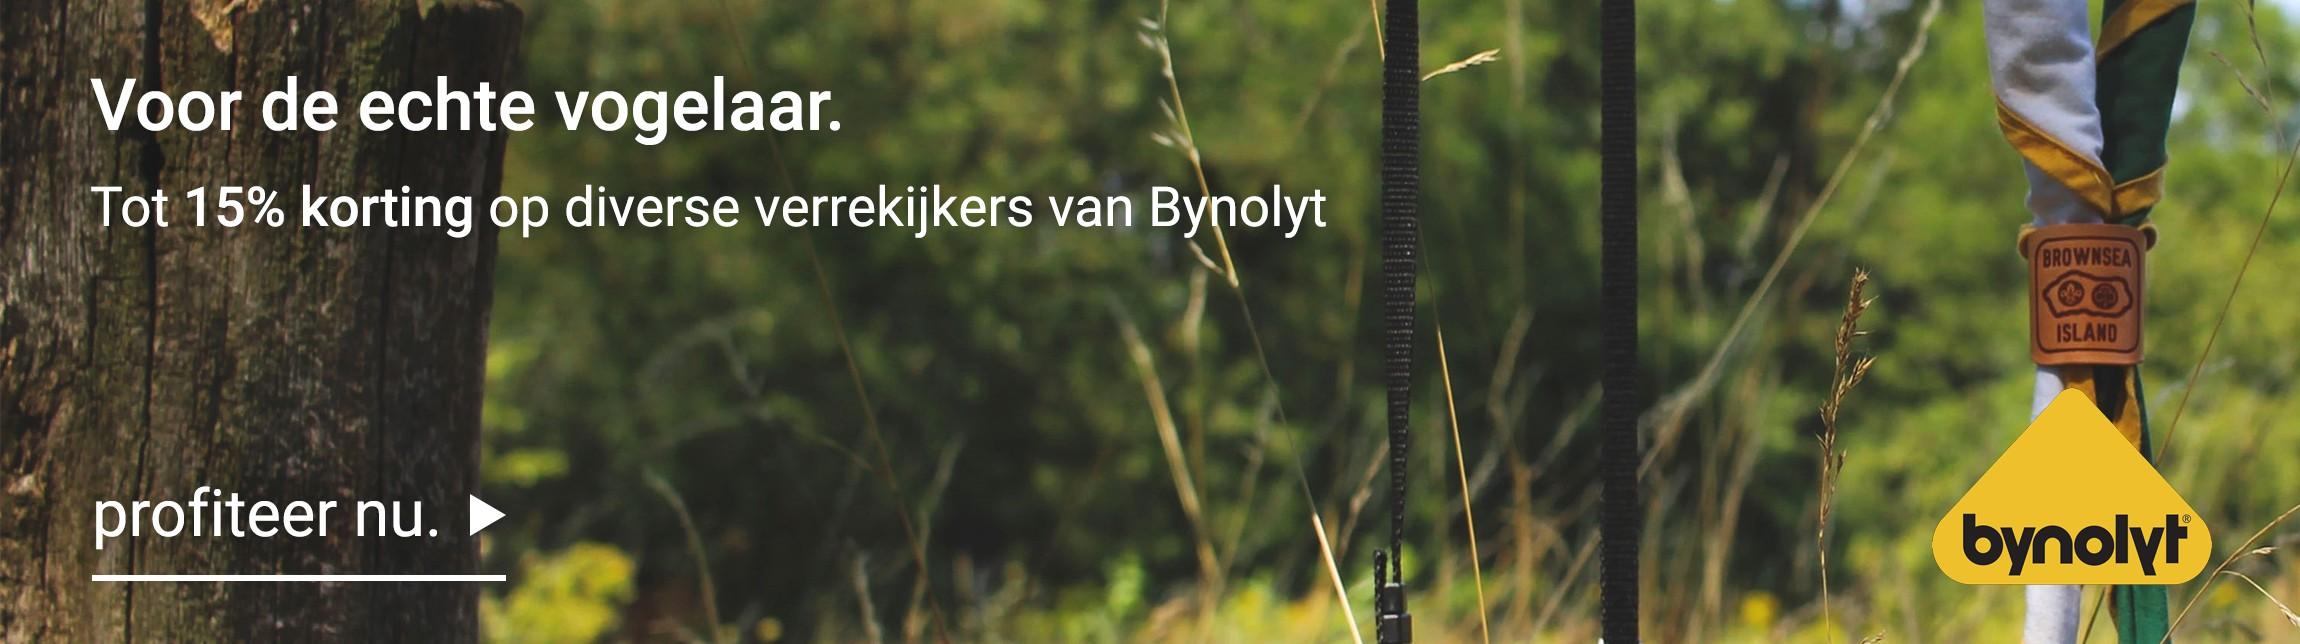 Bynolyt actieweken